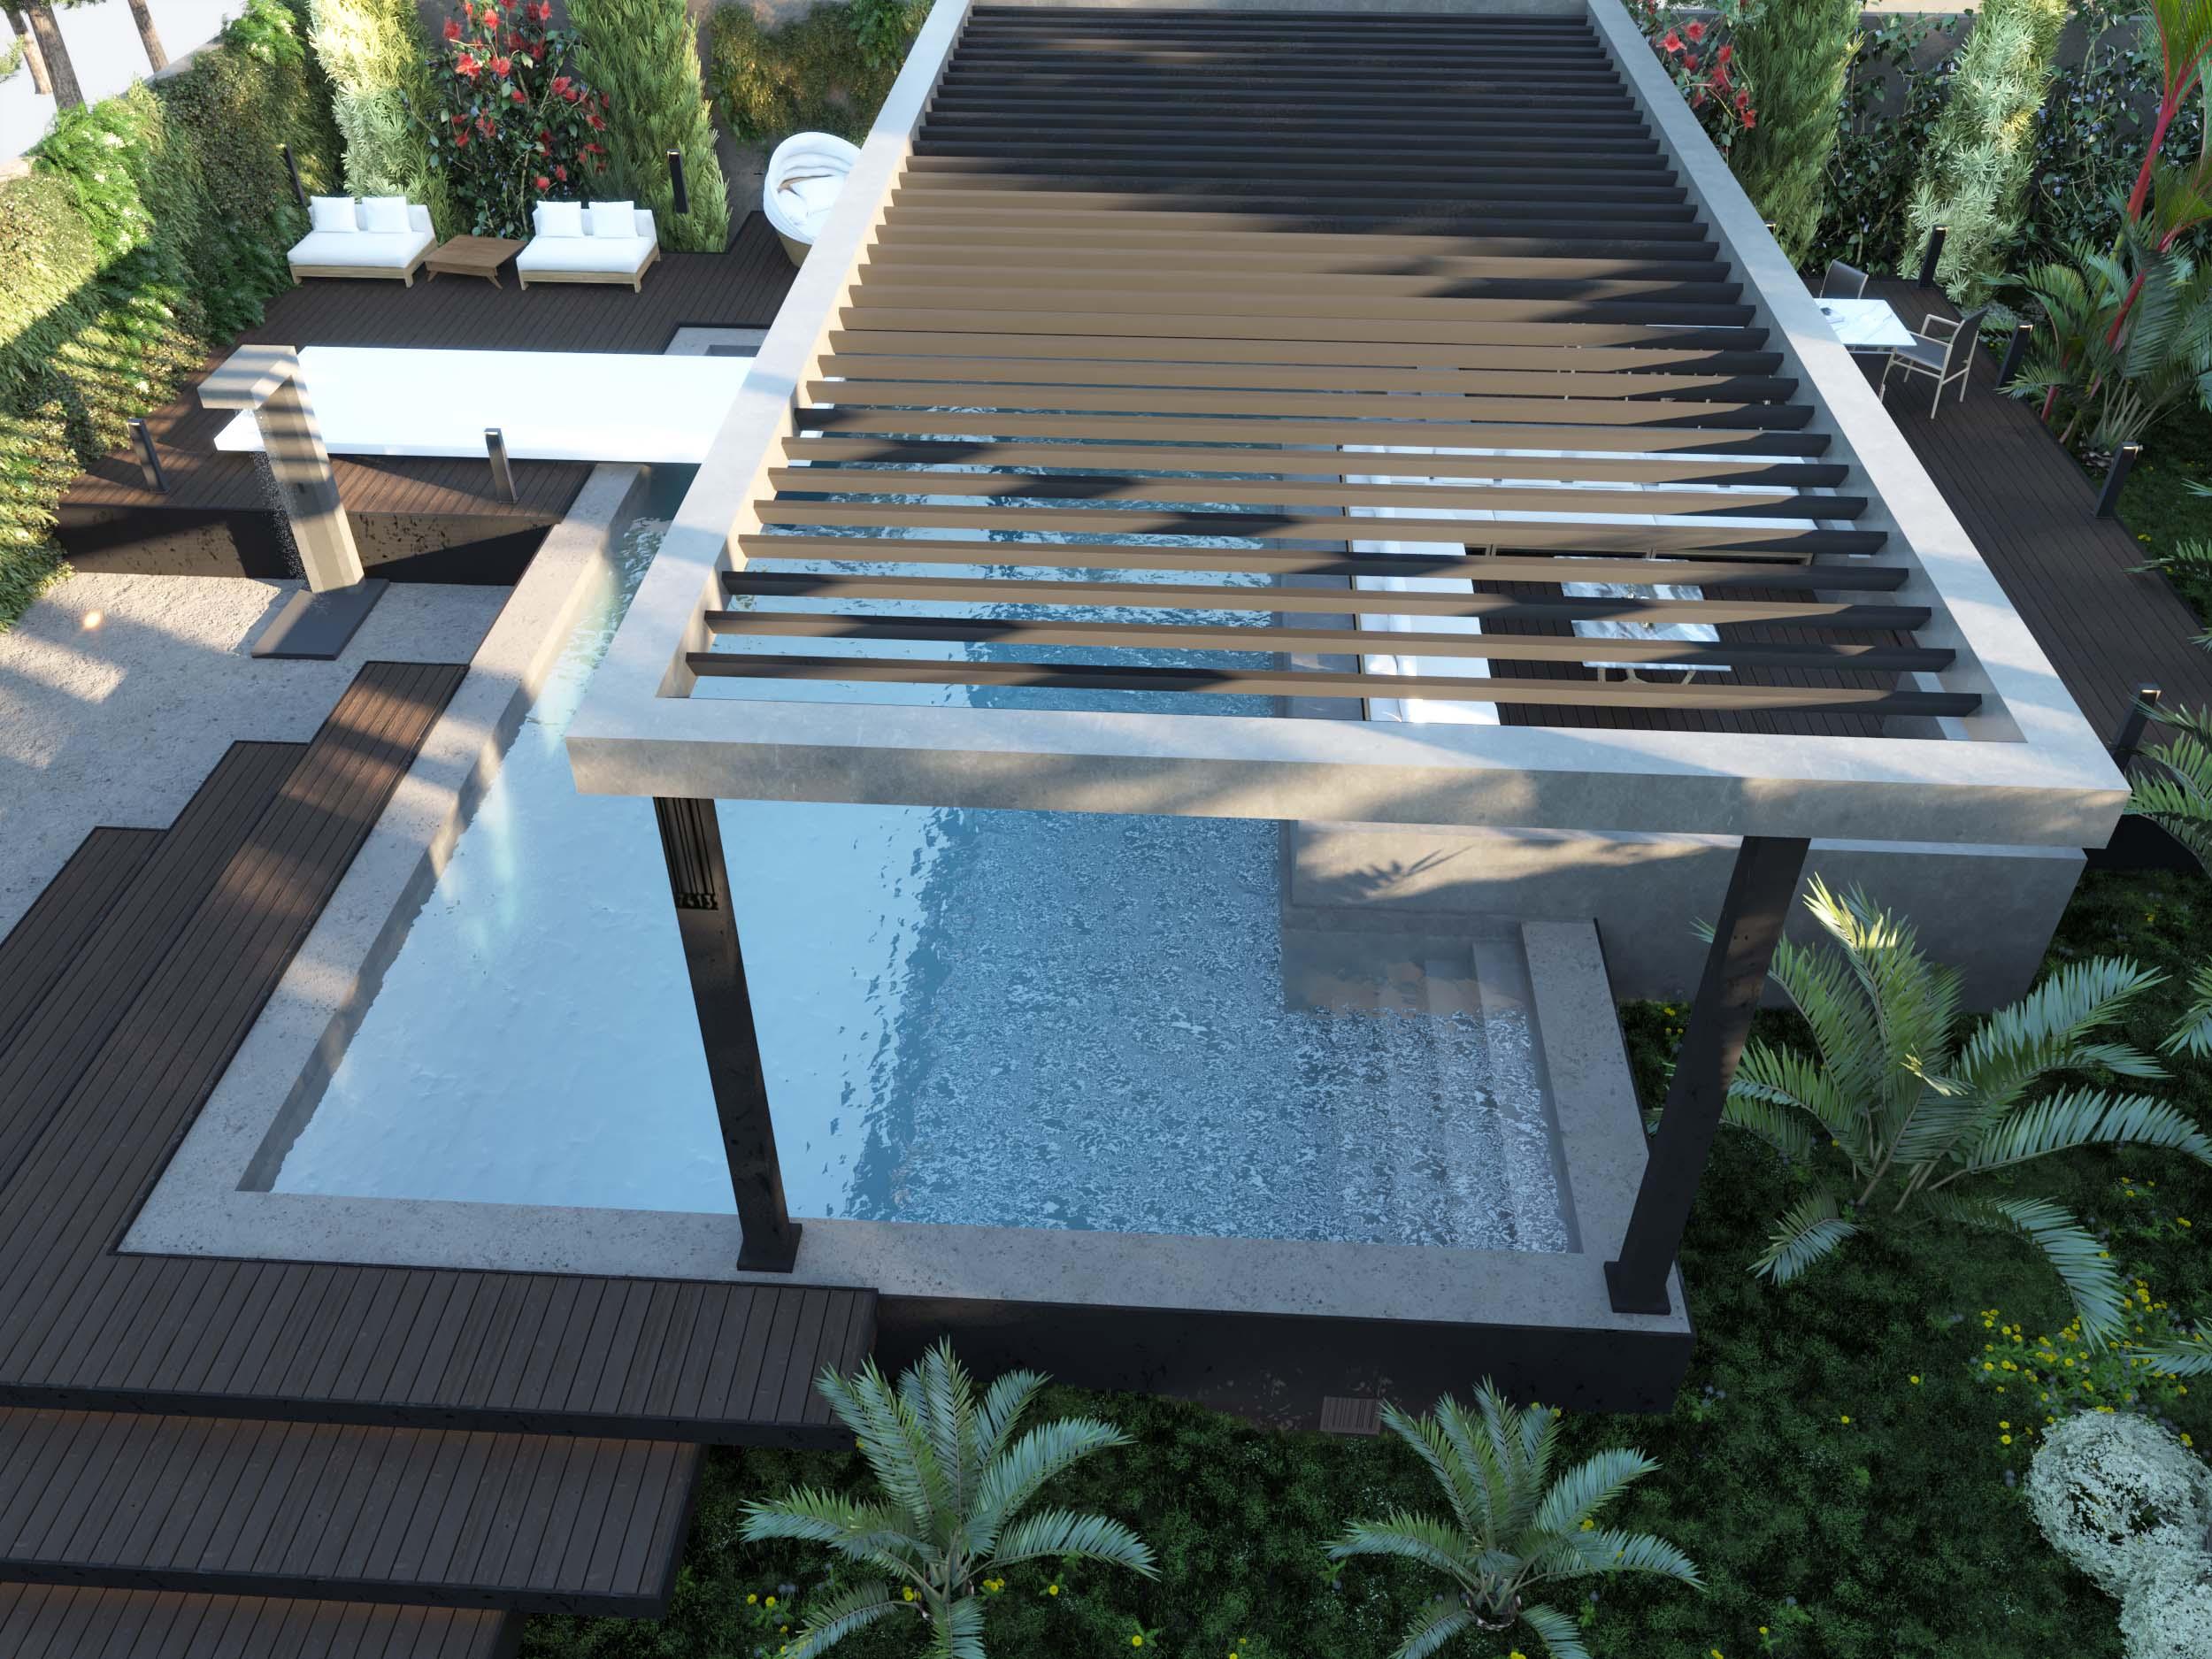 sun - shading - ambarella - trees - garden